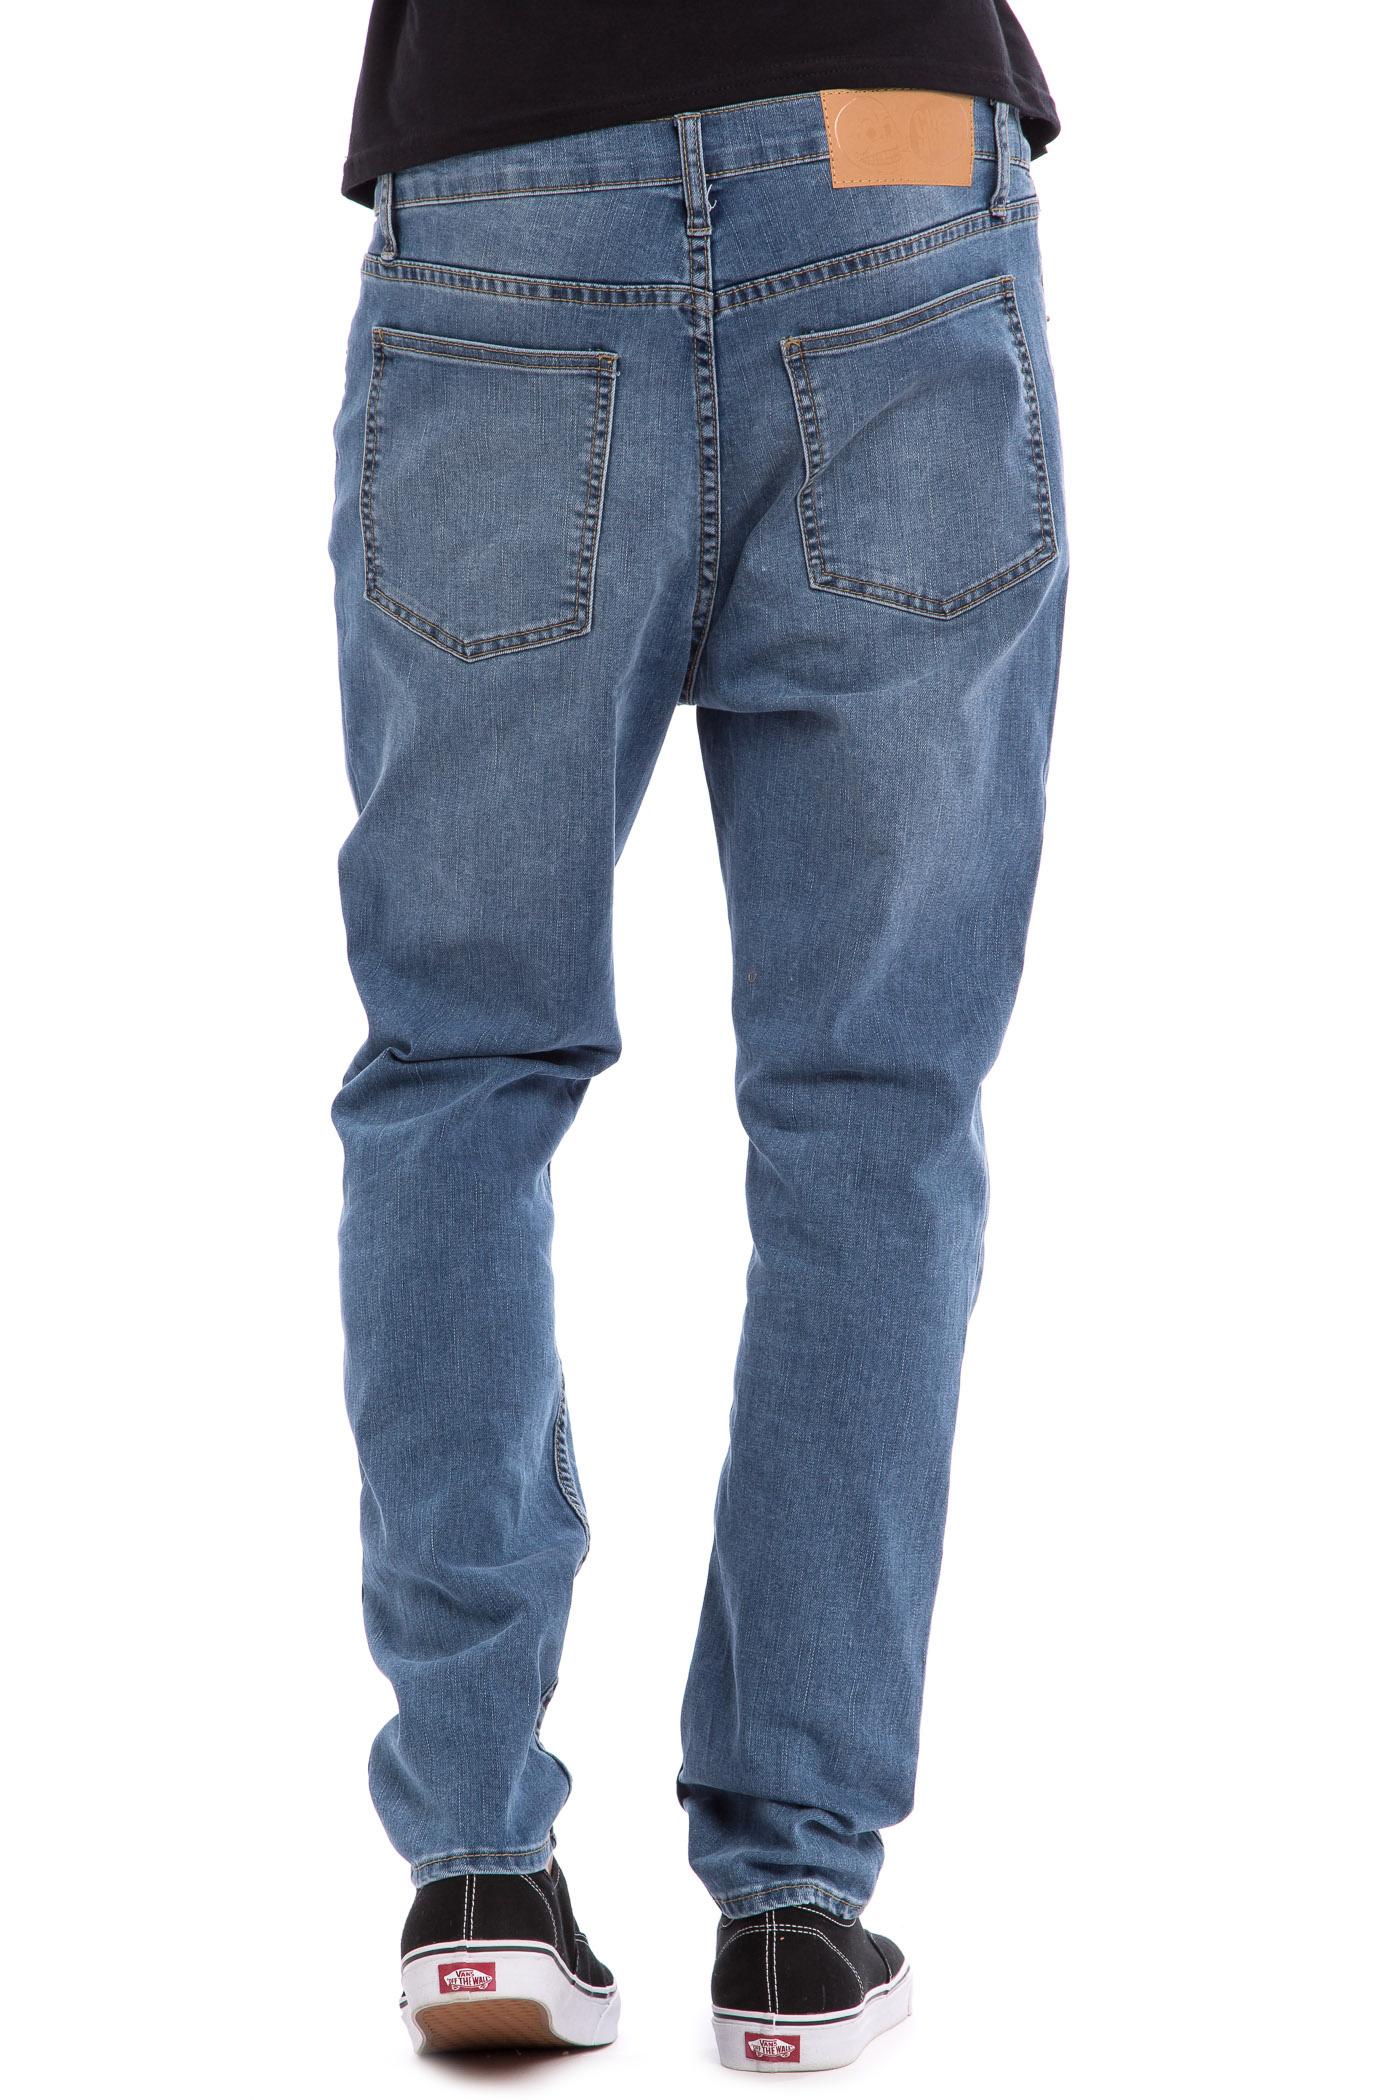 Cheap Monday Jeans Singapore